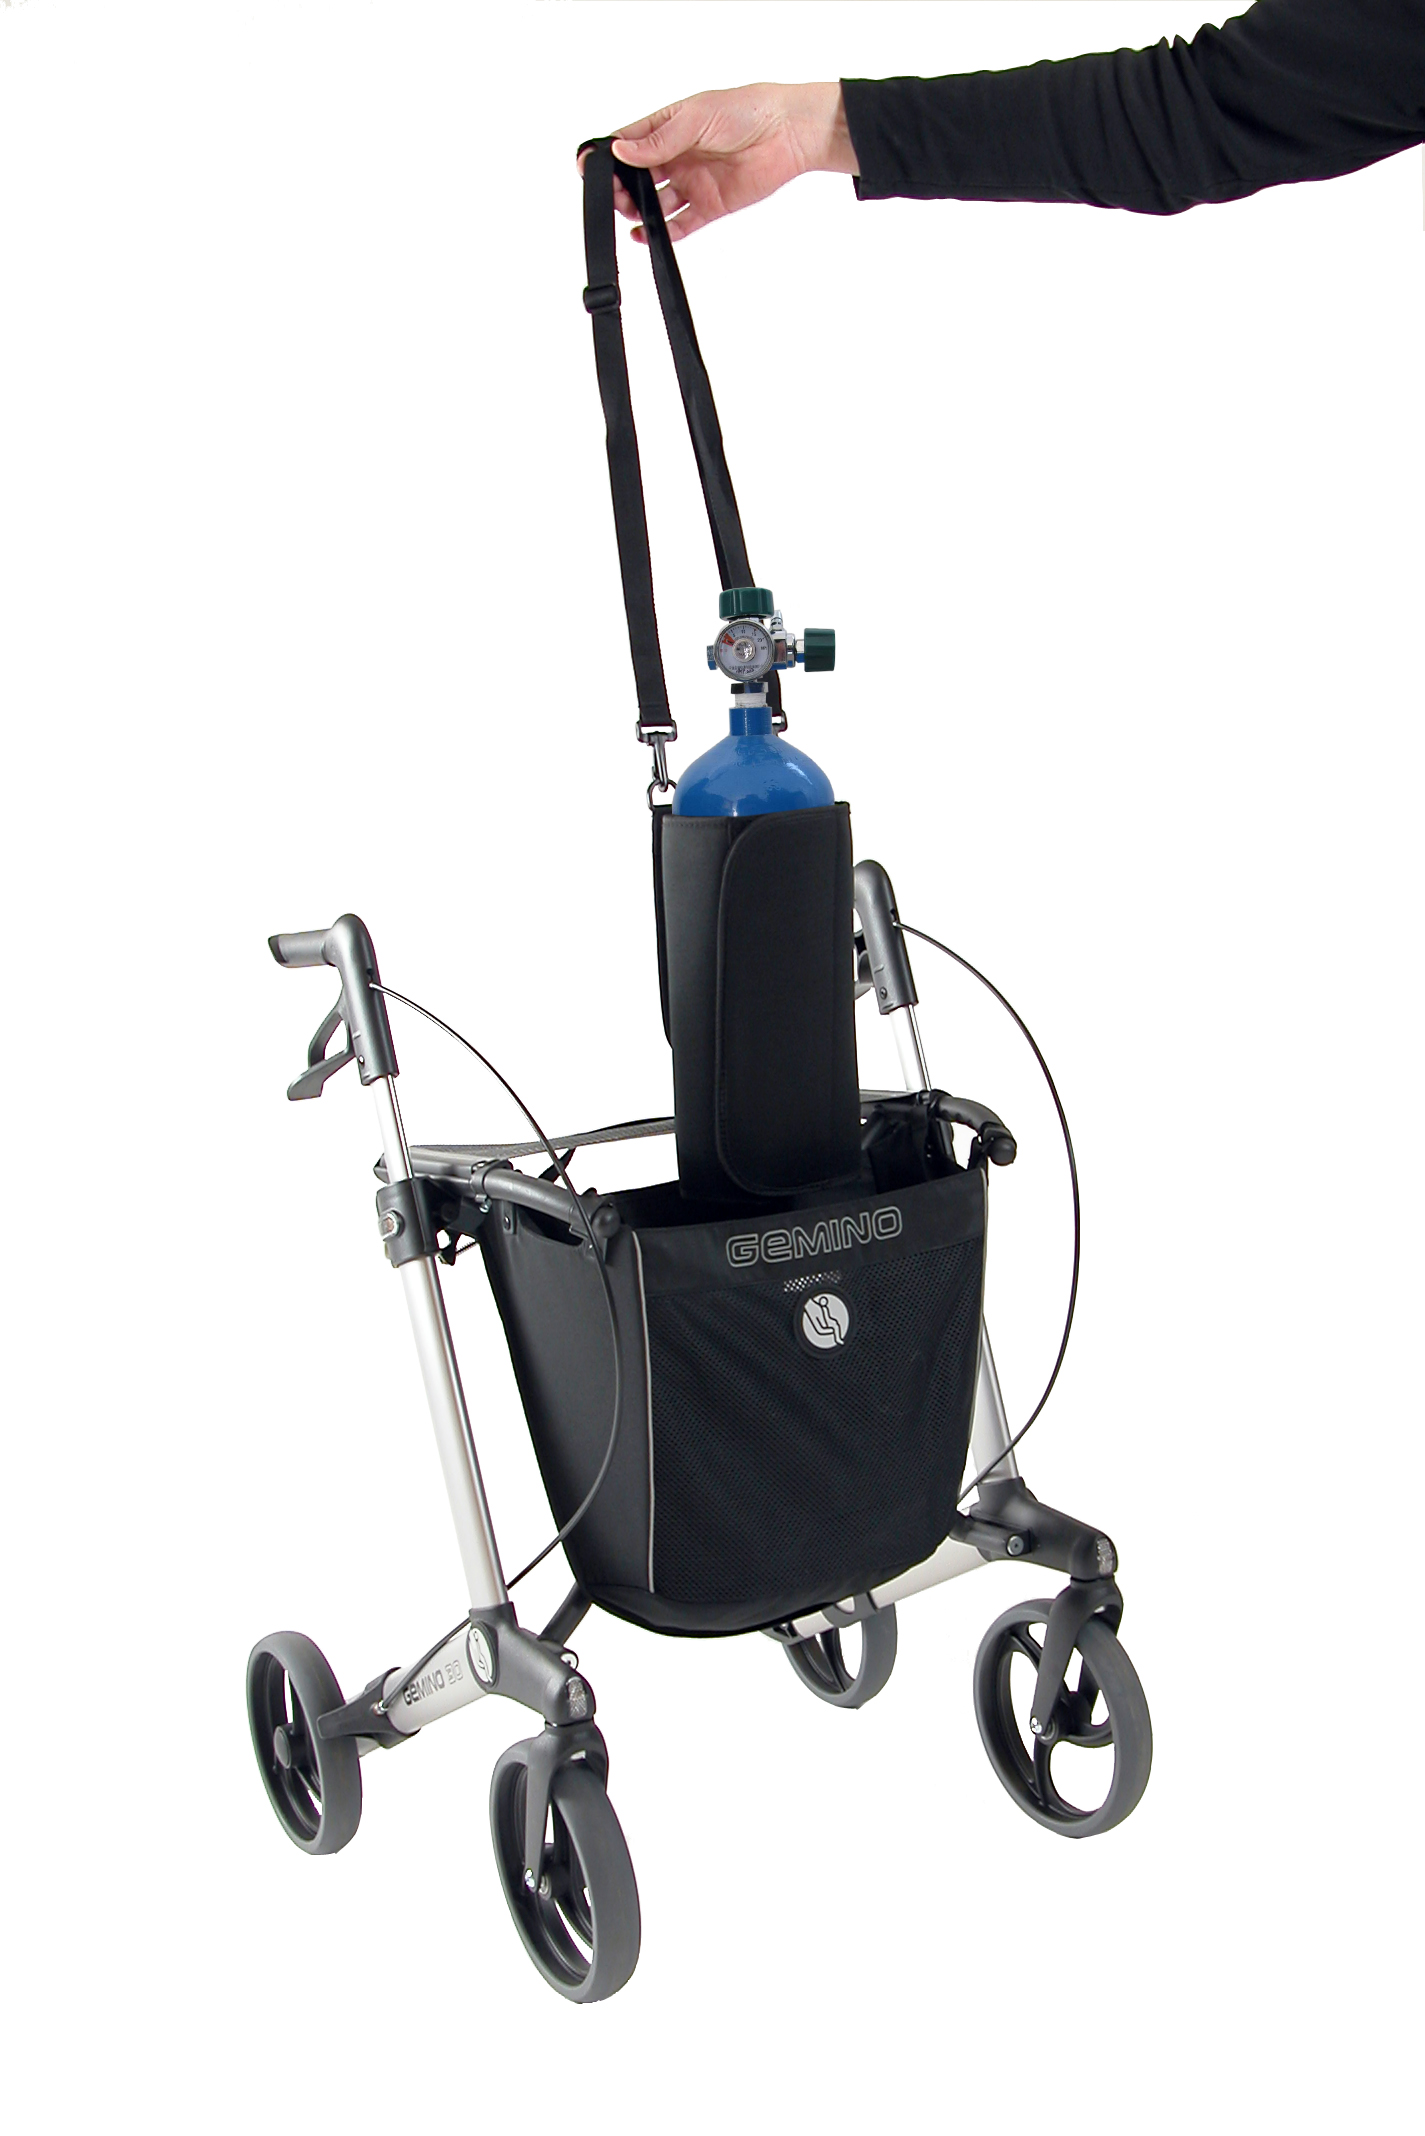 Mand voor zuurstofhouder voor Gemino rollator van Sunrise Medical